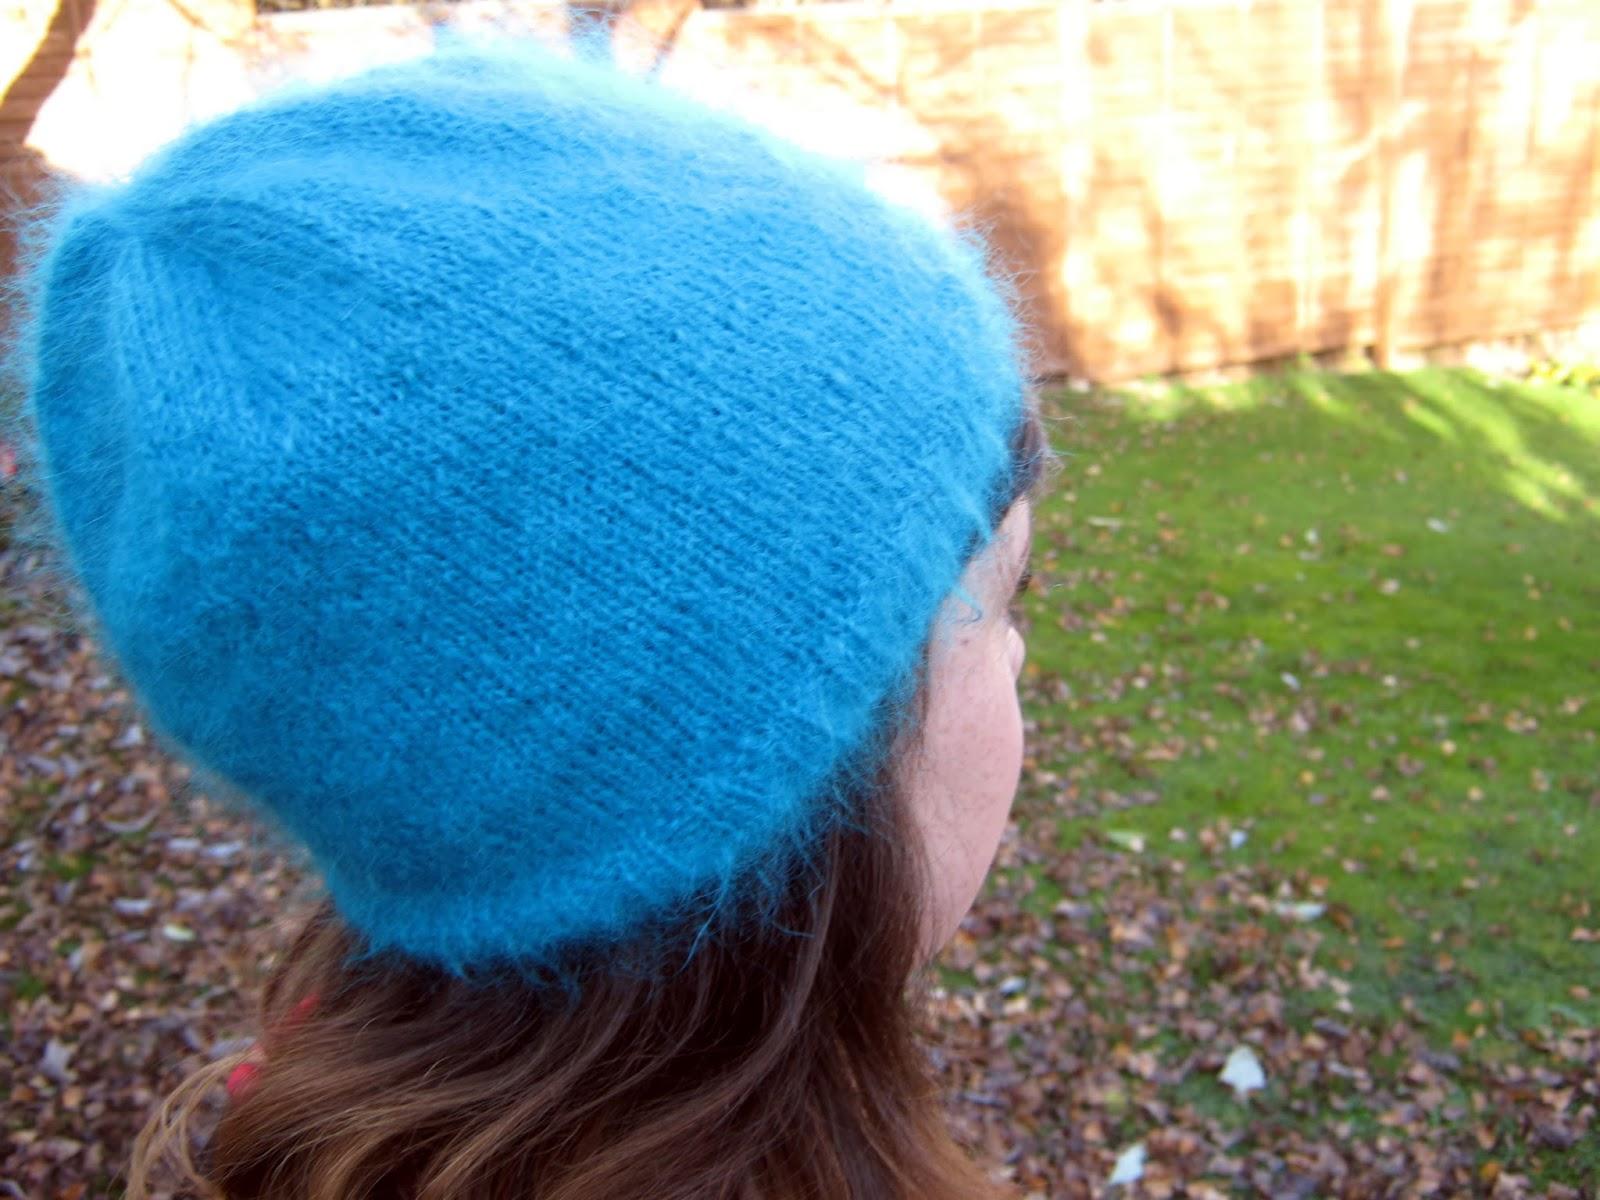 Knitting Pattern For Mohair Beanie : Free Knitting Pattern: Mohair Beanie Awake + Make A Blog for Creative Living